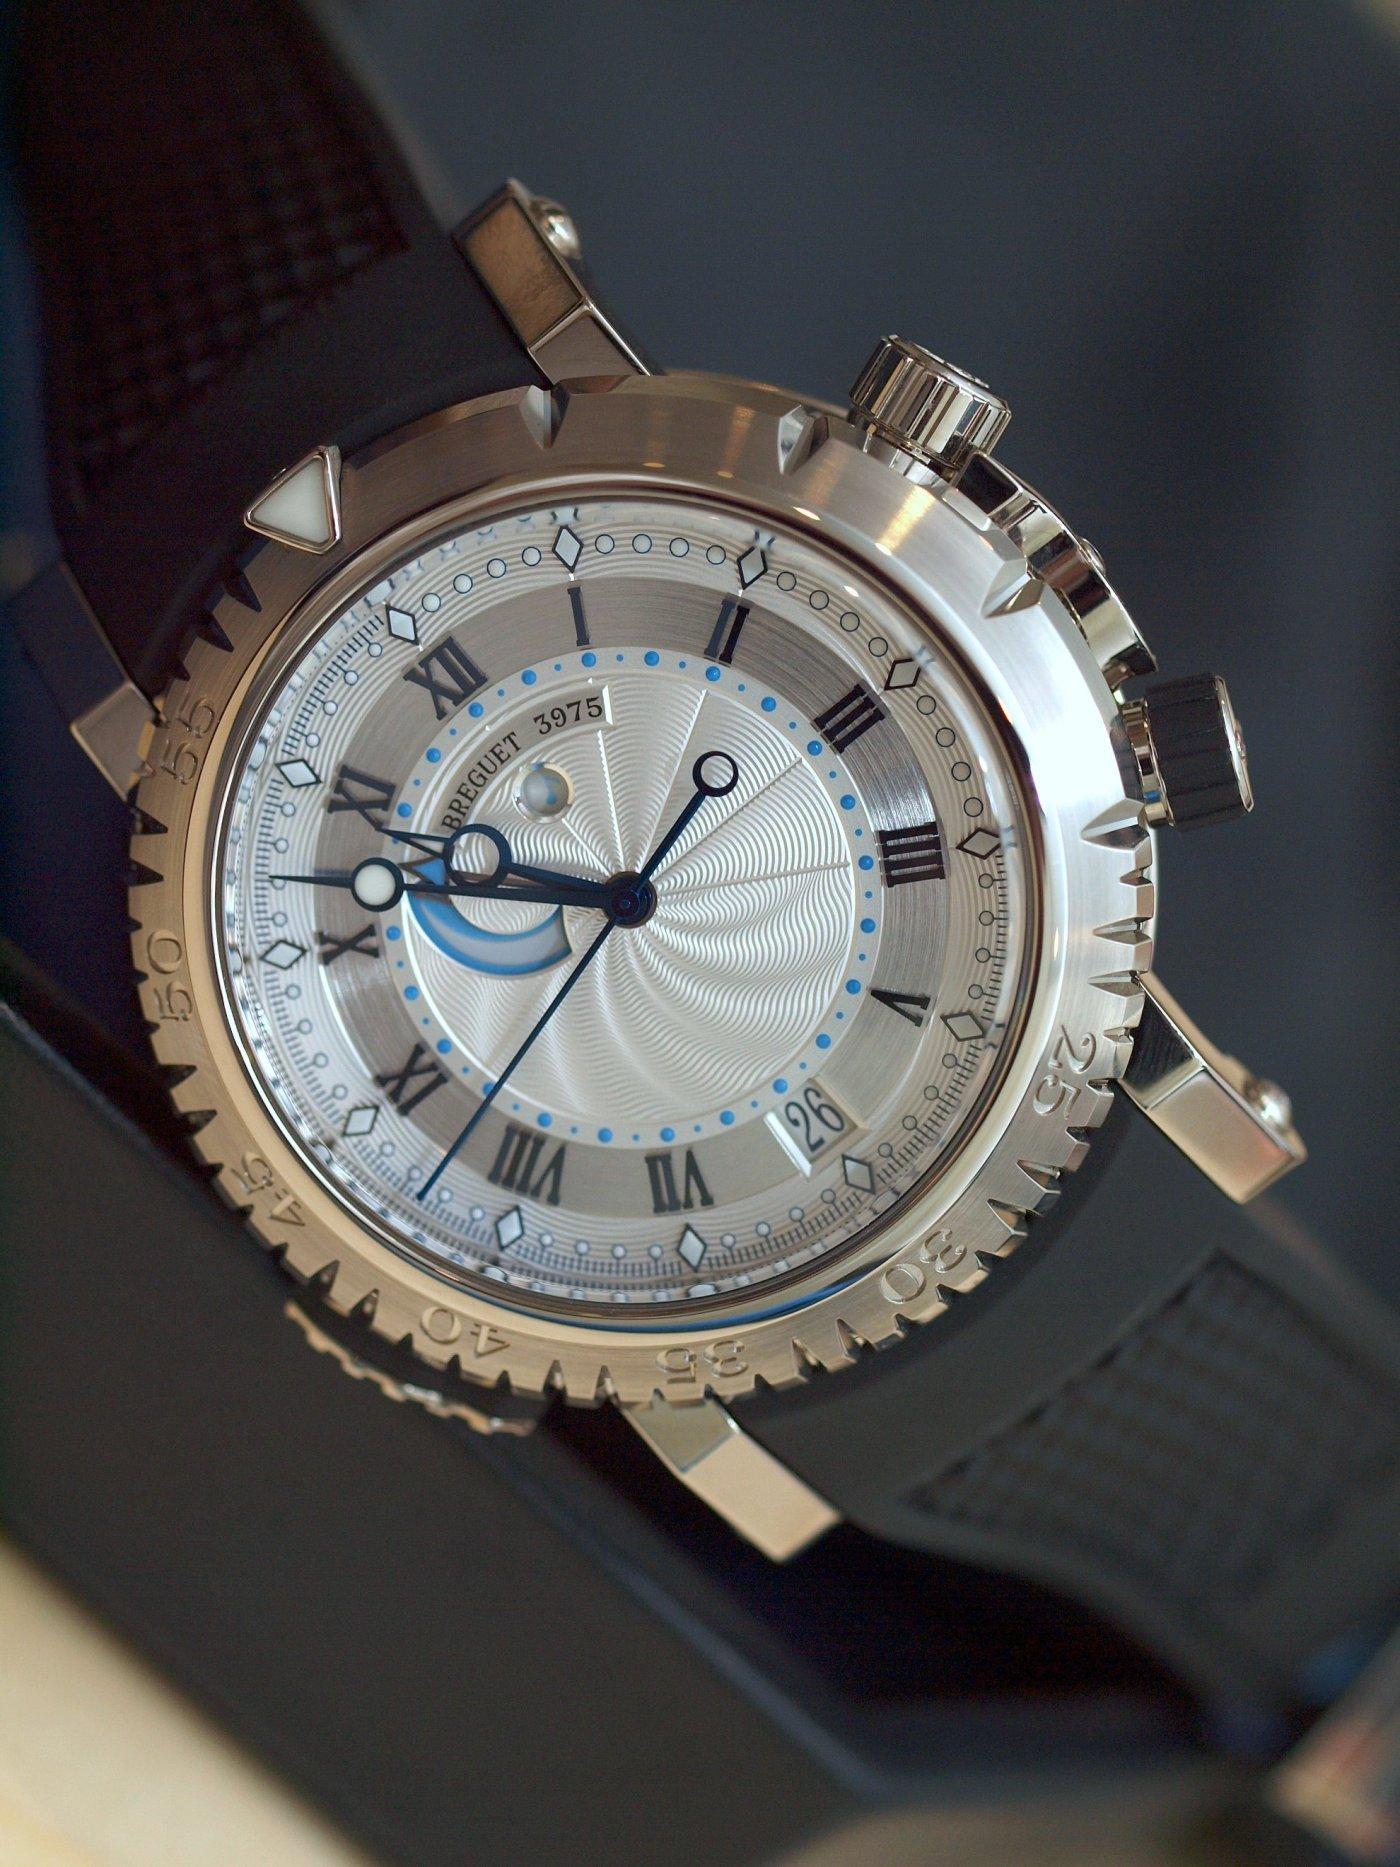 Breguet Marine Royale white gold